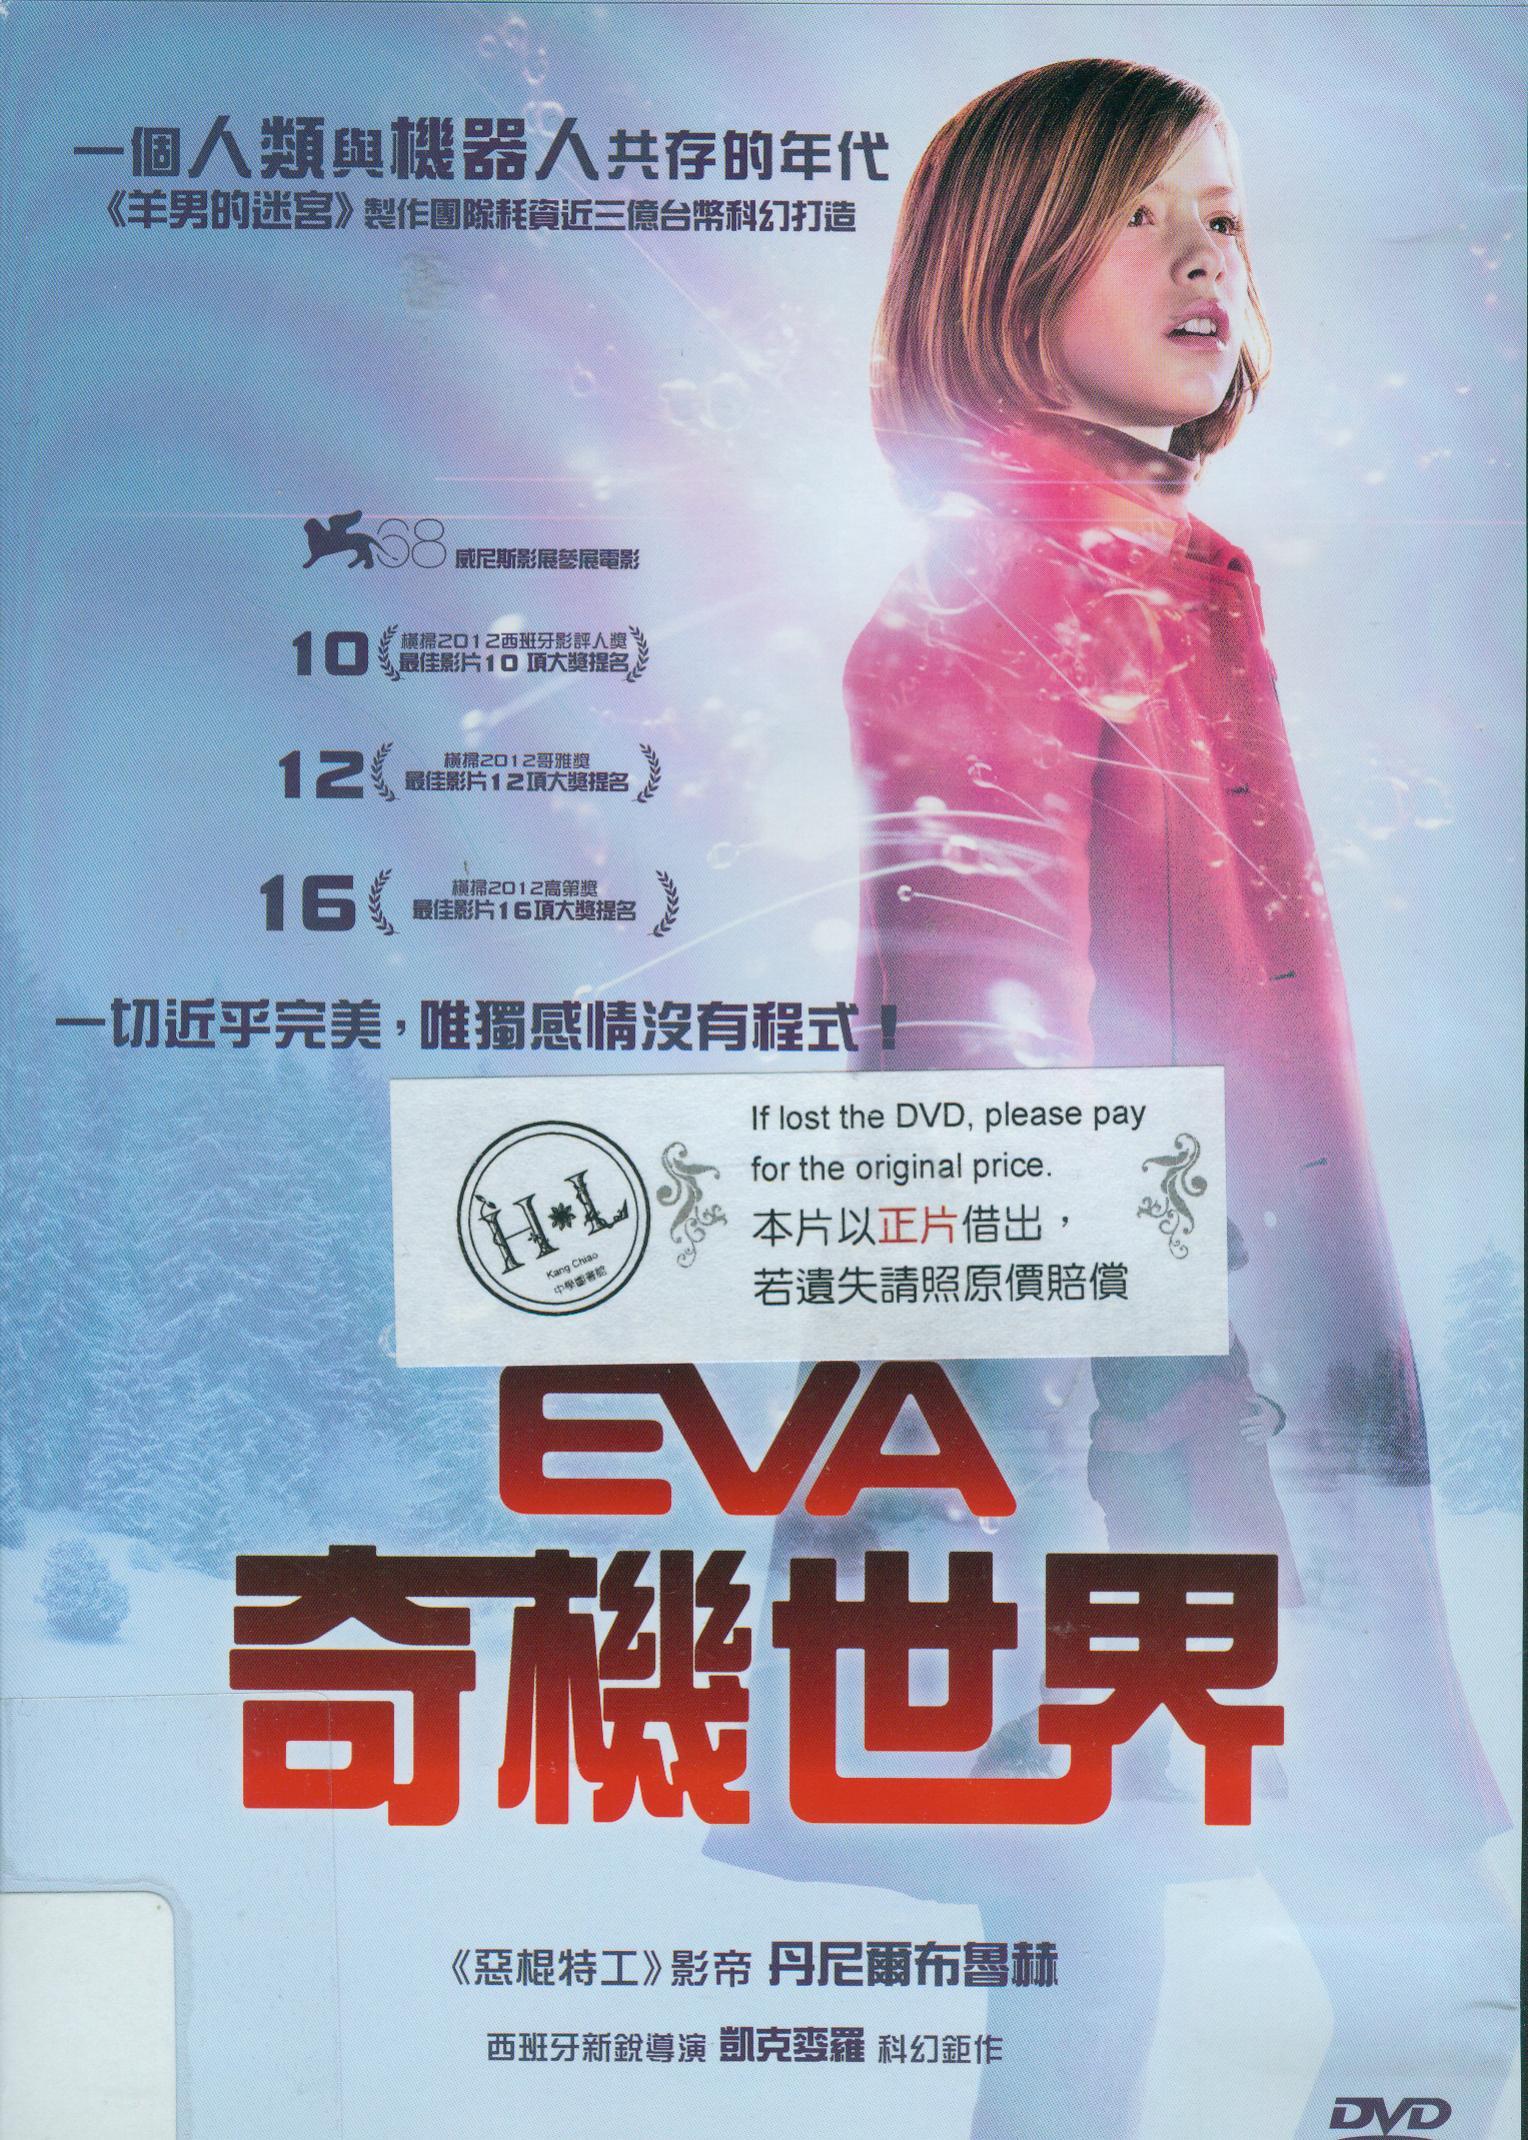 EVA奇機世界[保護級:科幻、冒險] : EVA